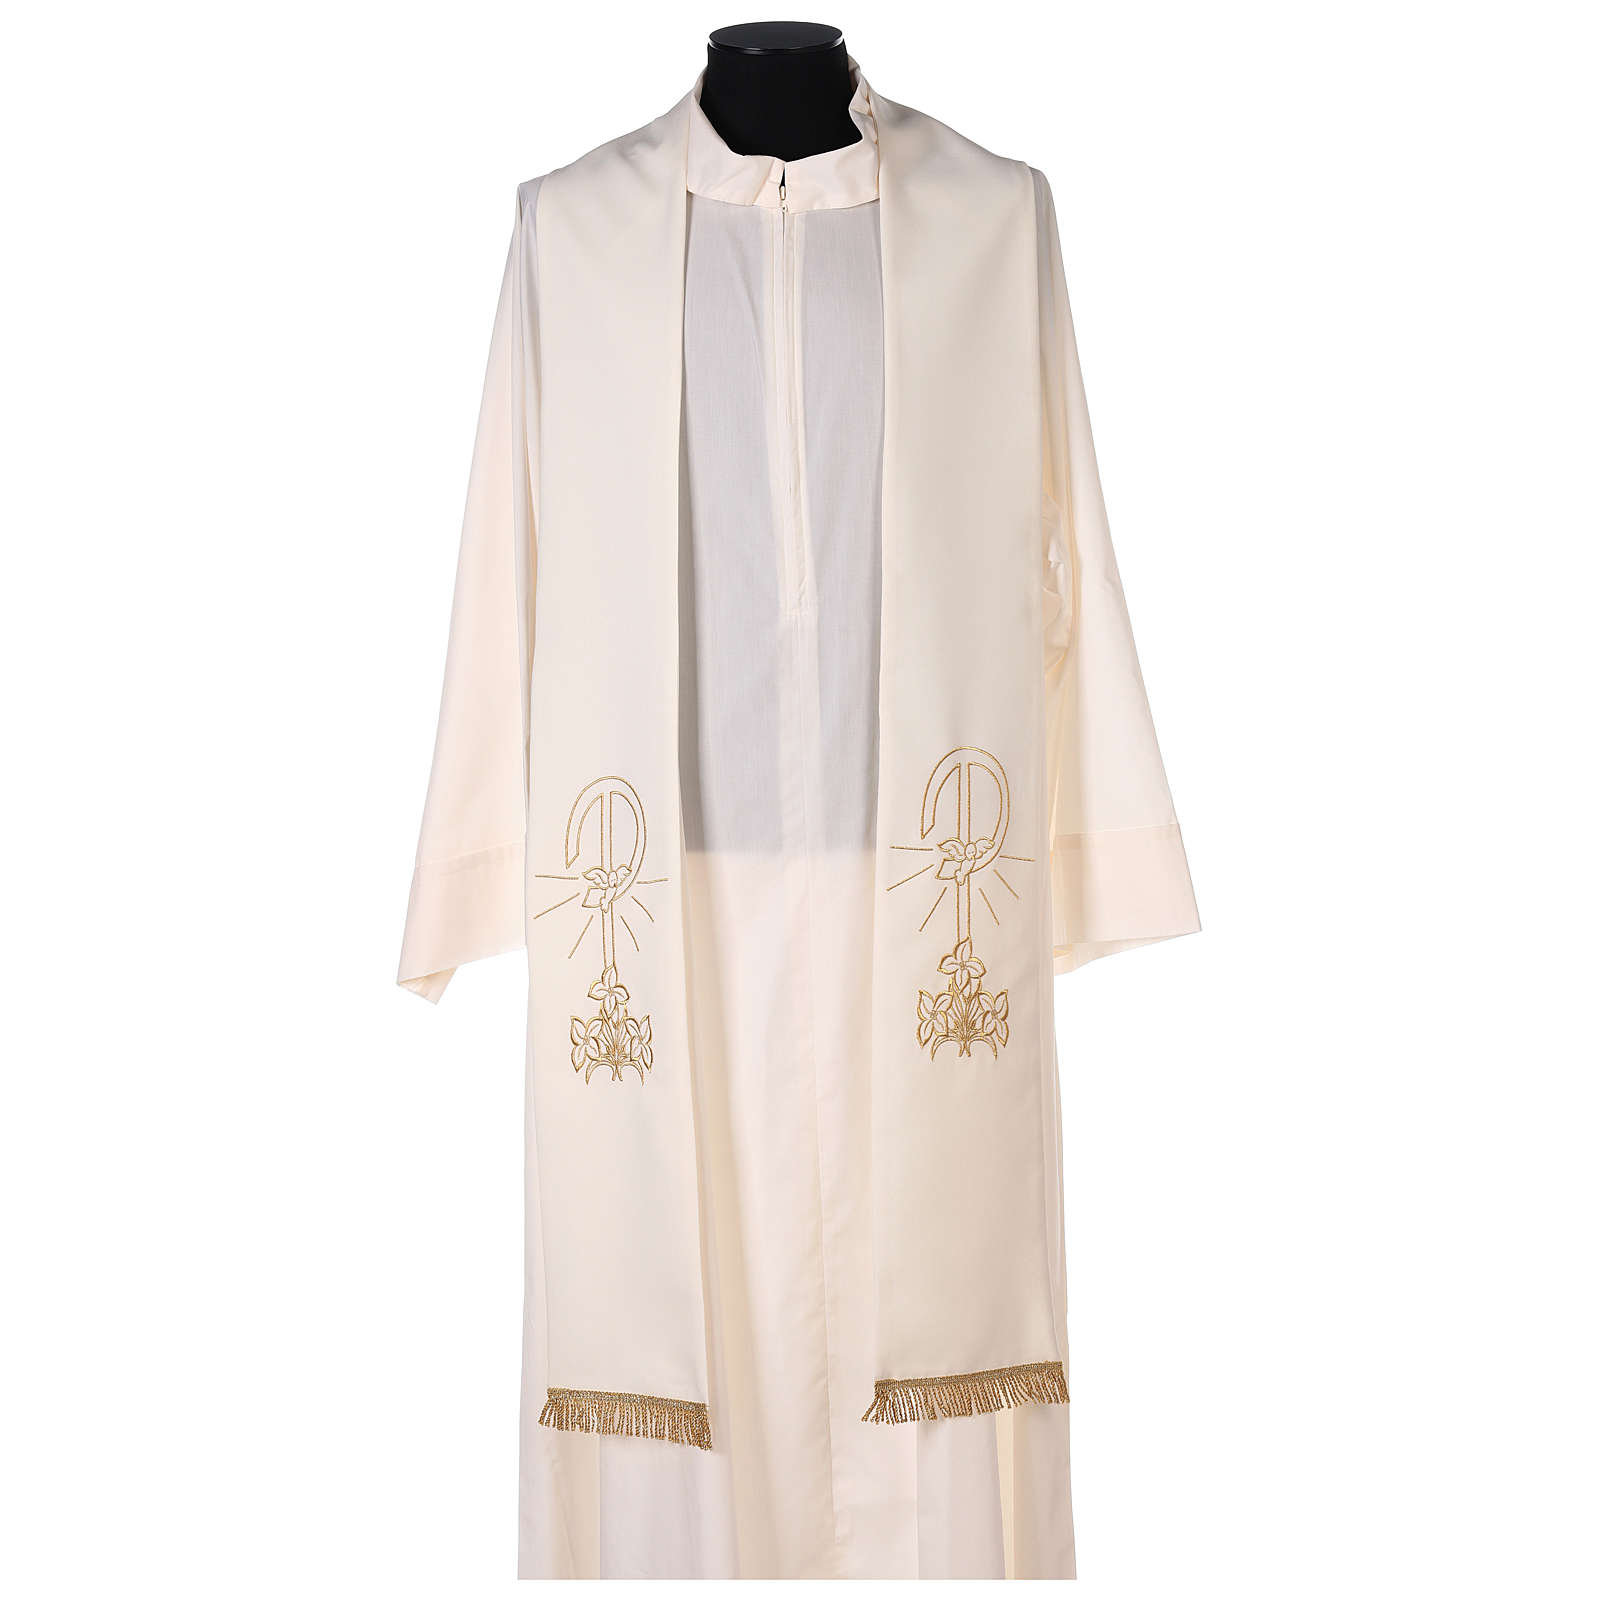 Estola sacerdotal bordado dorado Paz Lirios doble cara poliéster 4